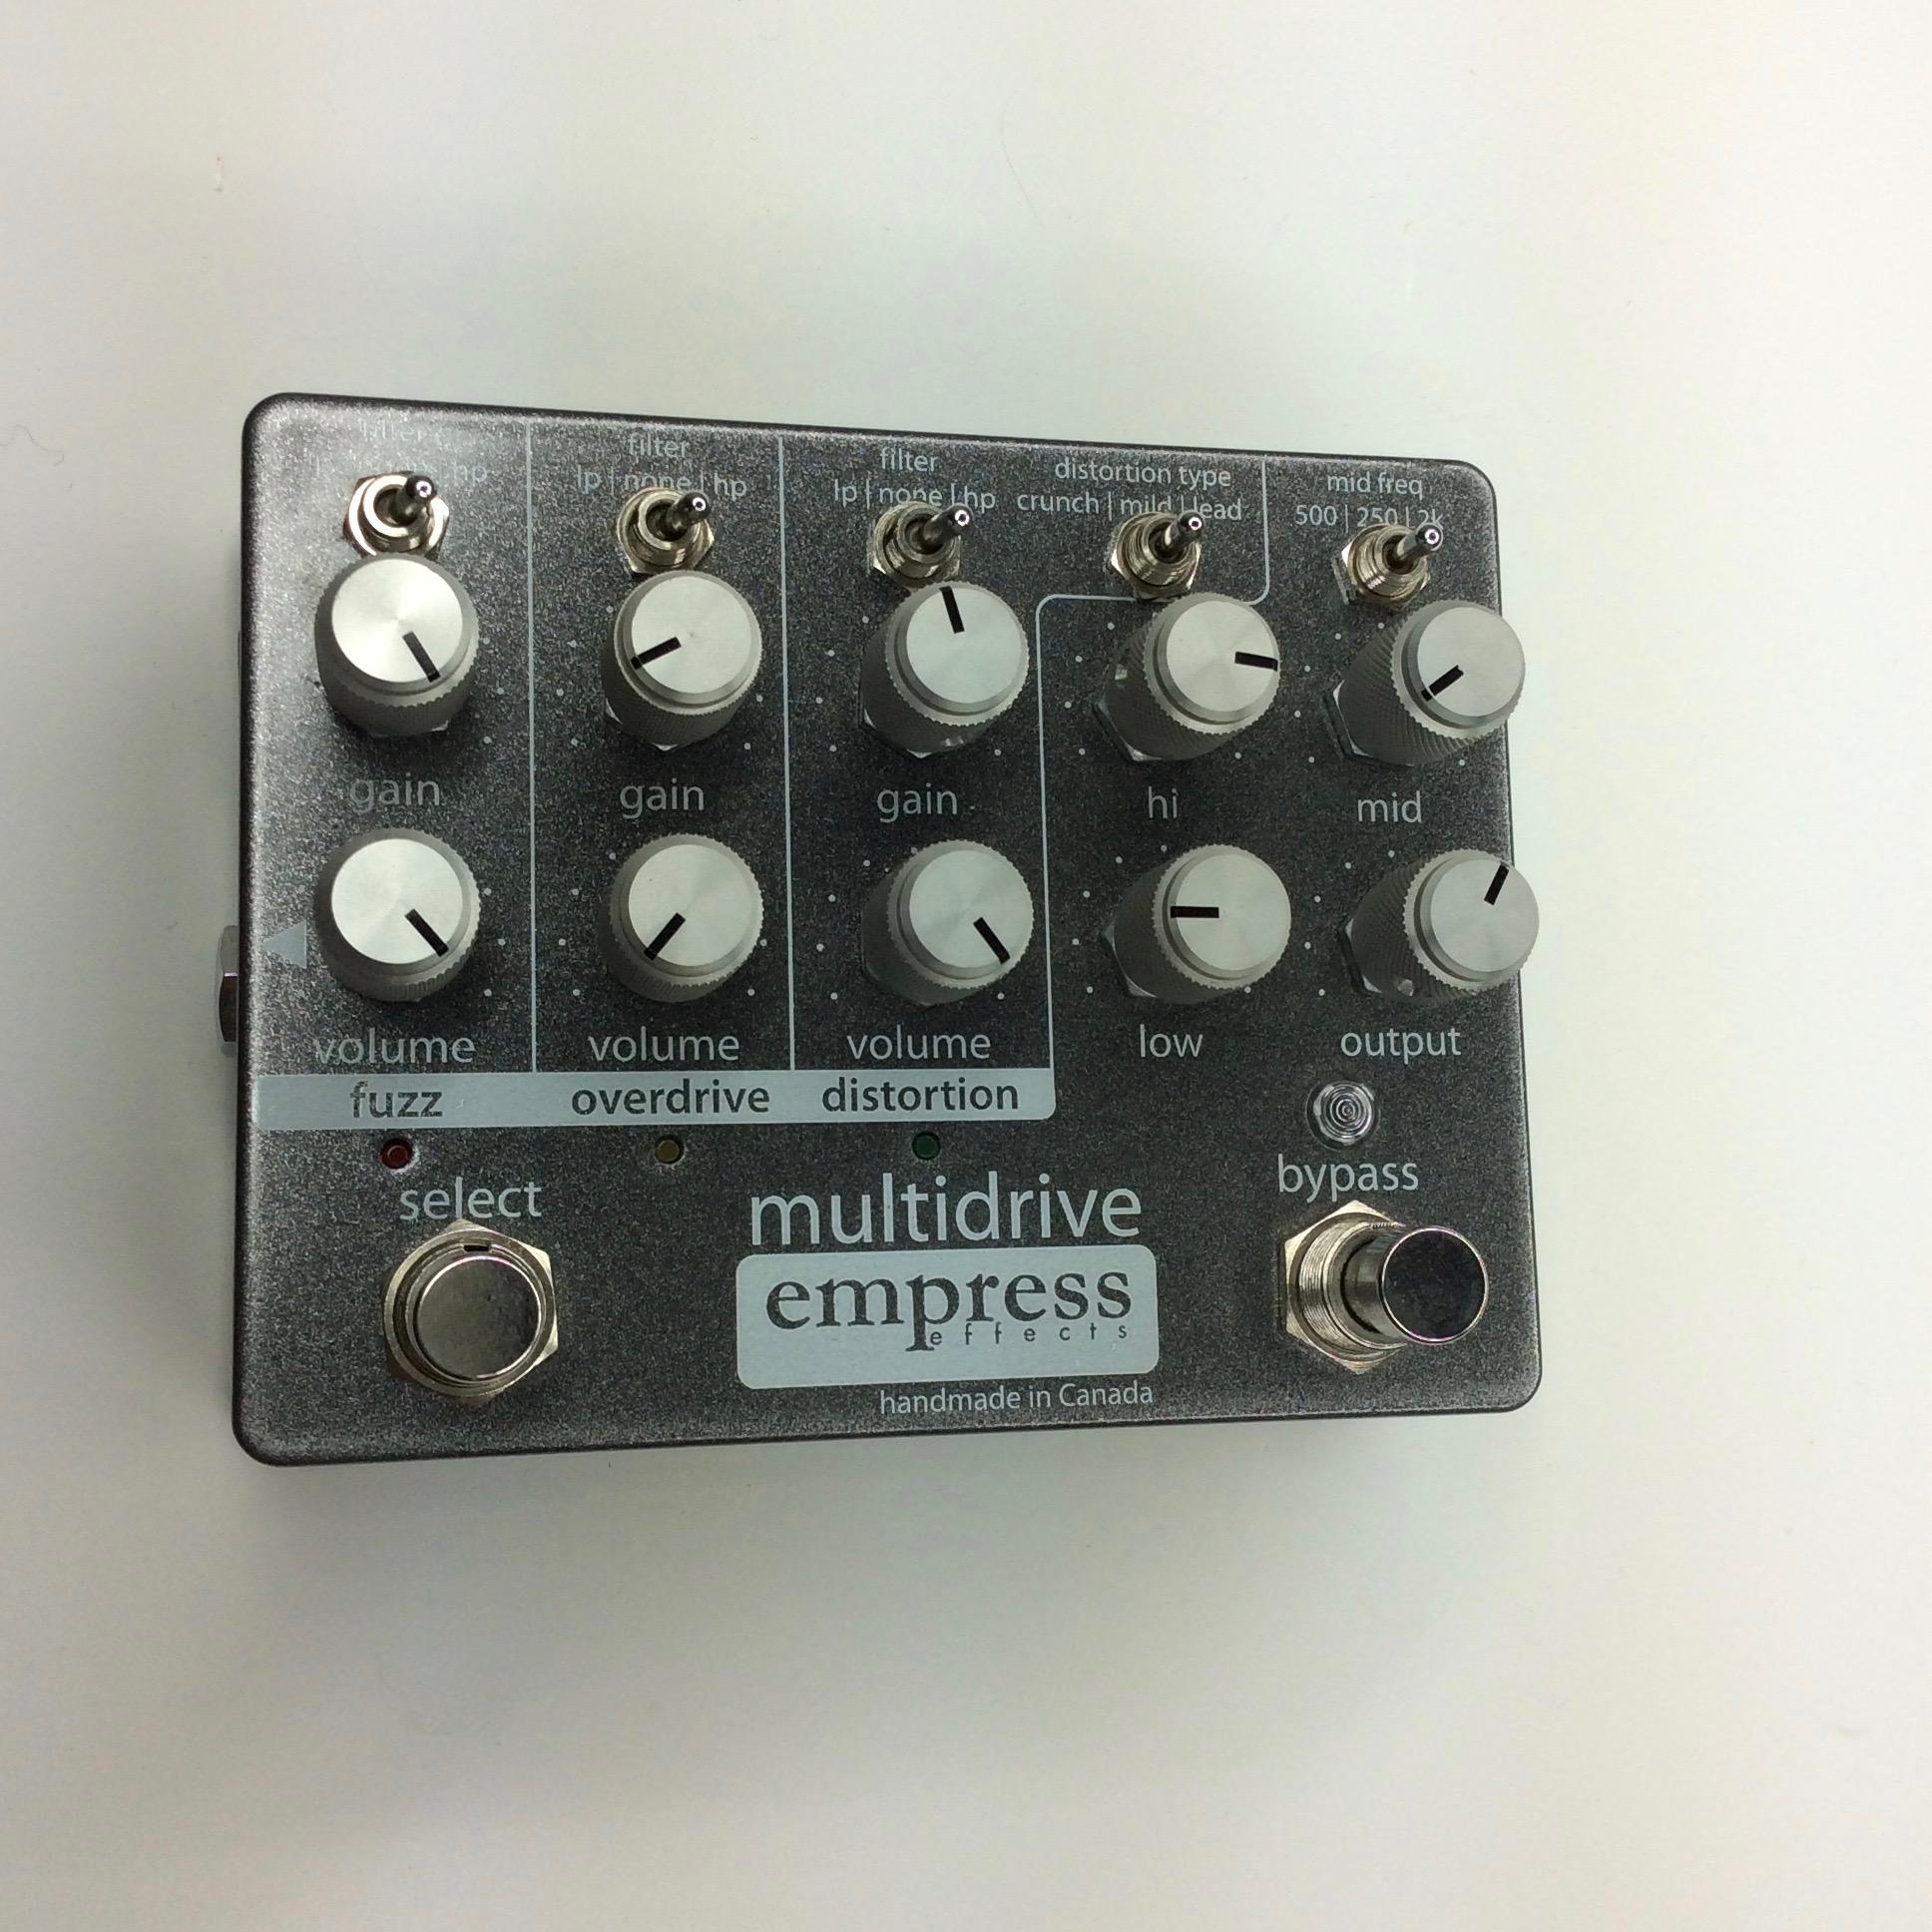 Multidrive  Make: empress